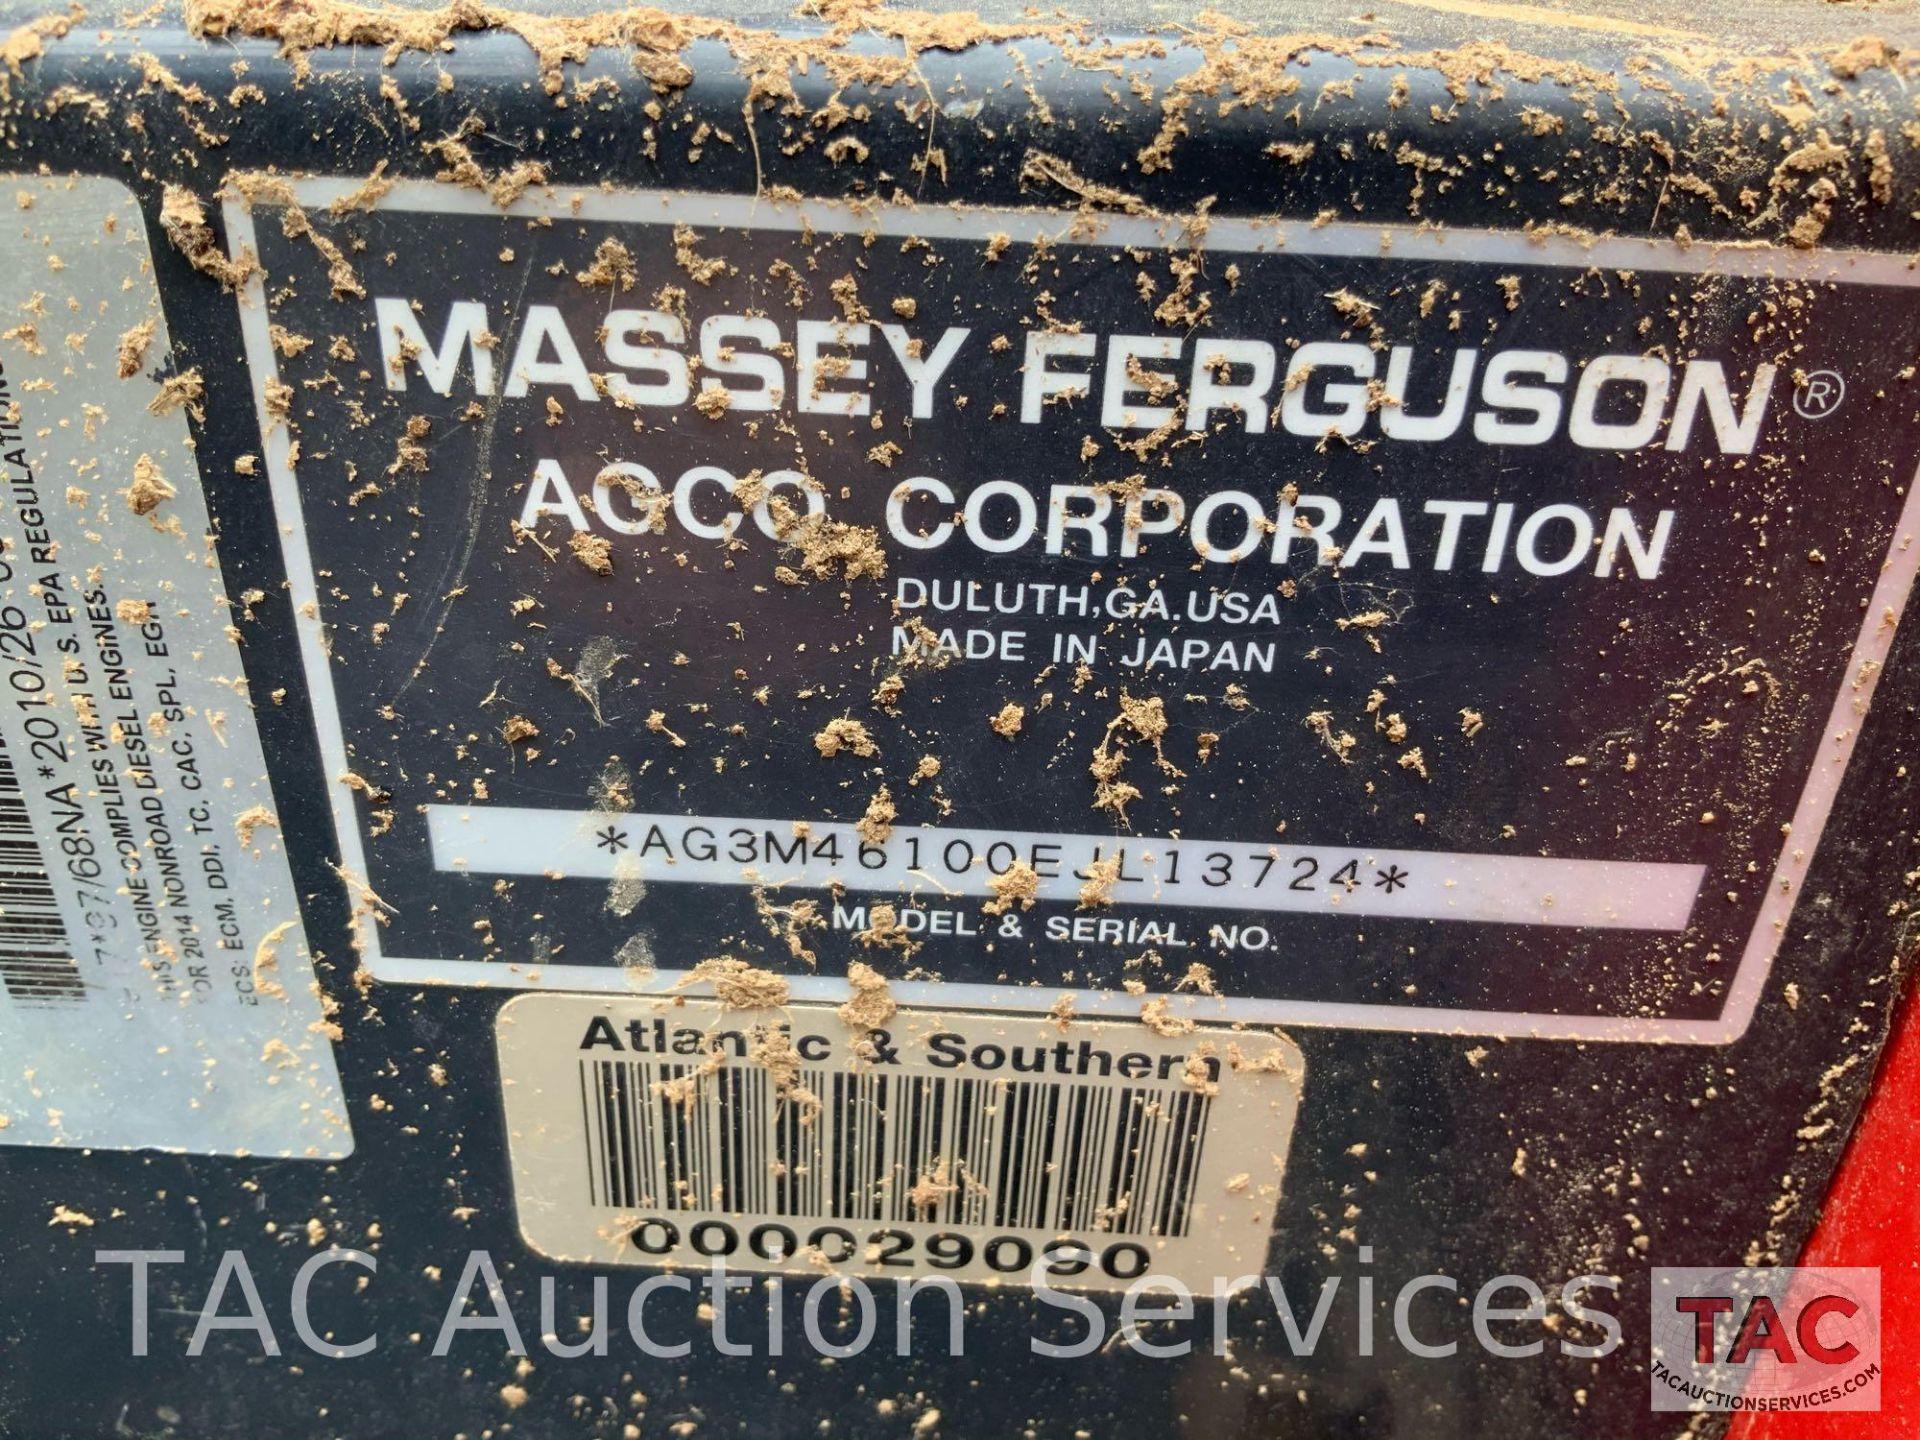 Massey-Ferguson 4610LP Farm Tractor - Image 26 of 26